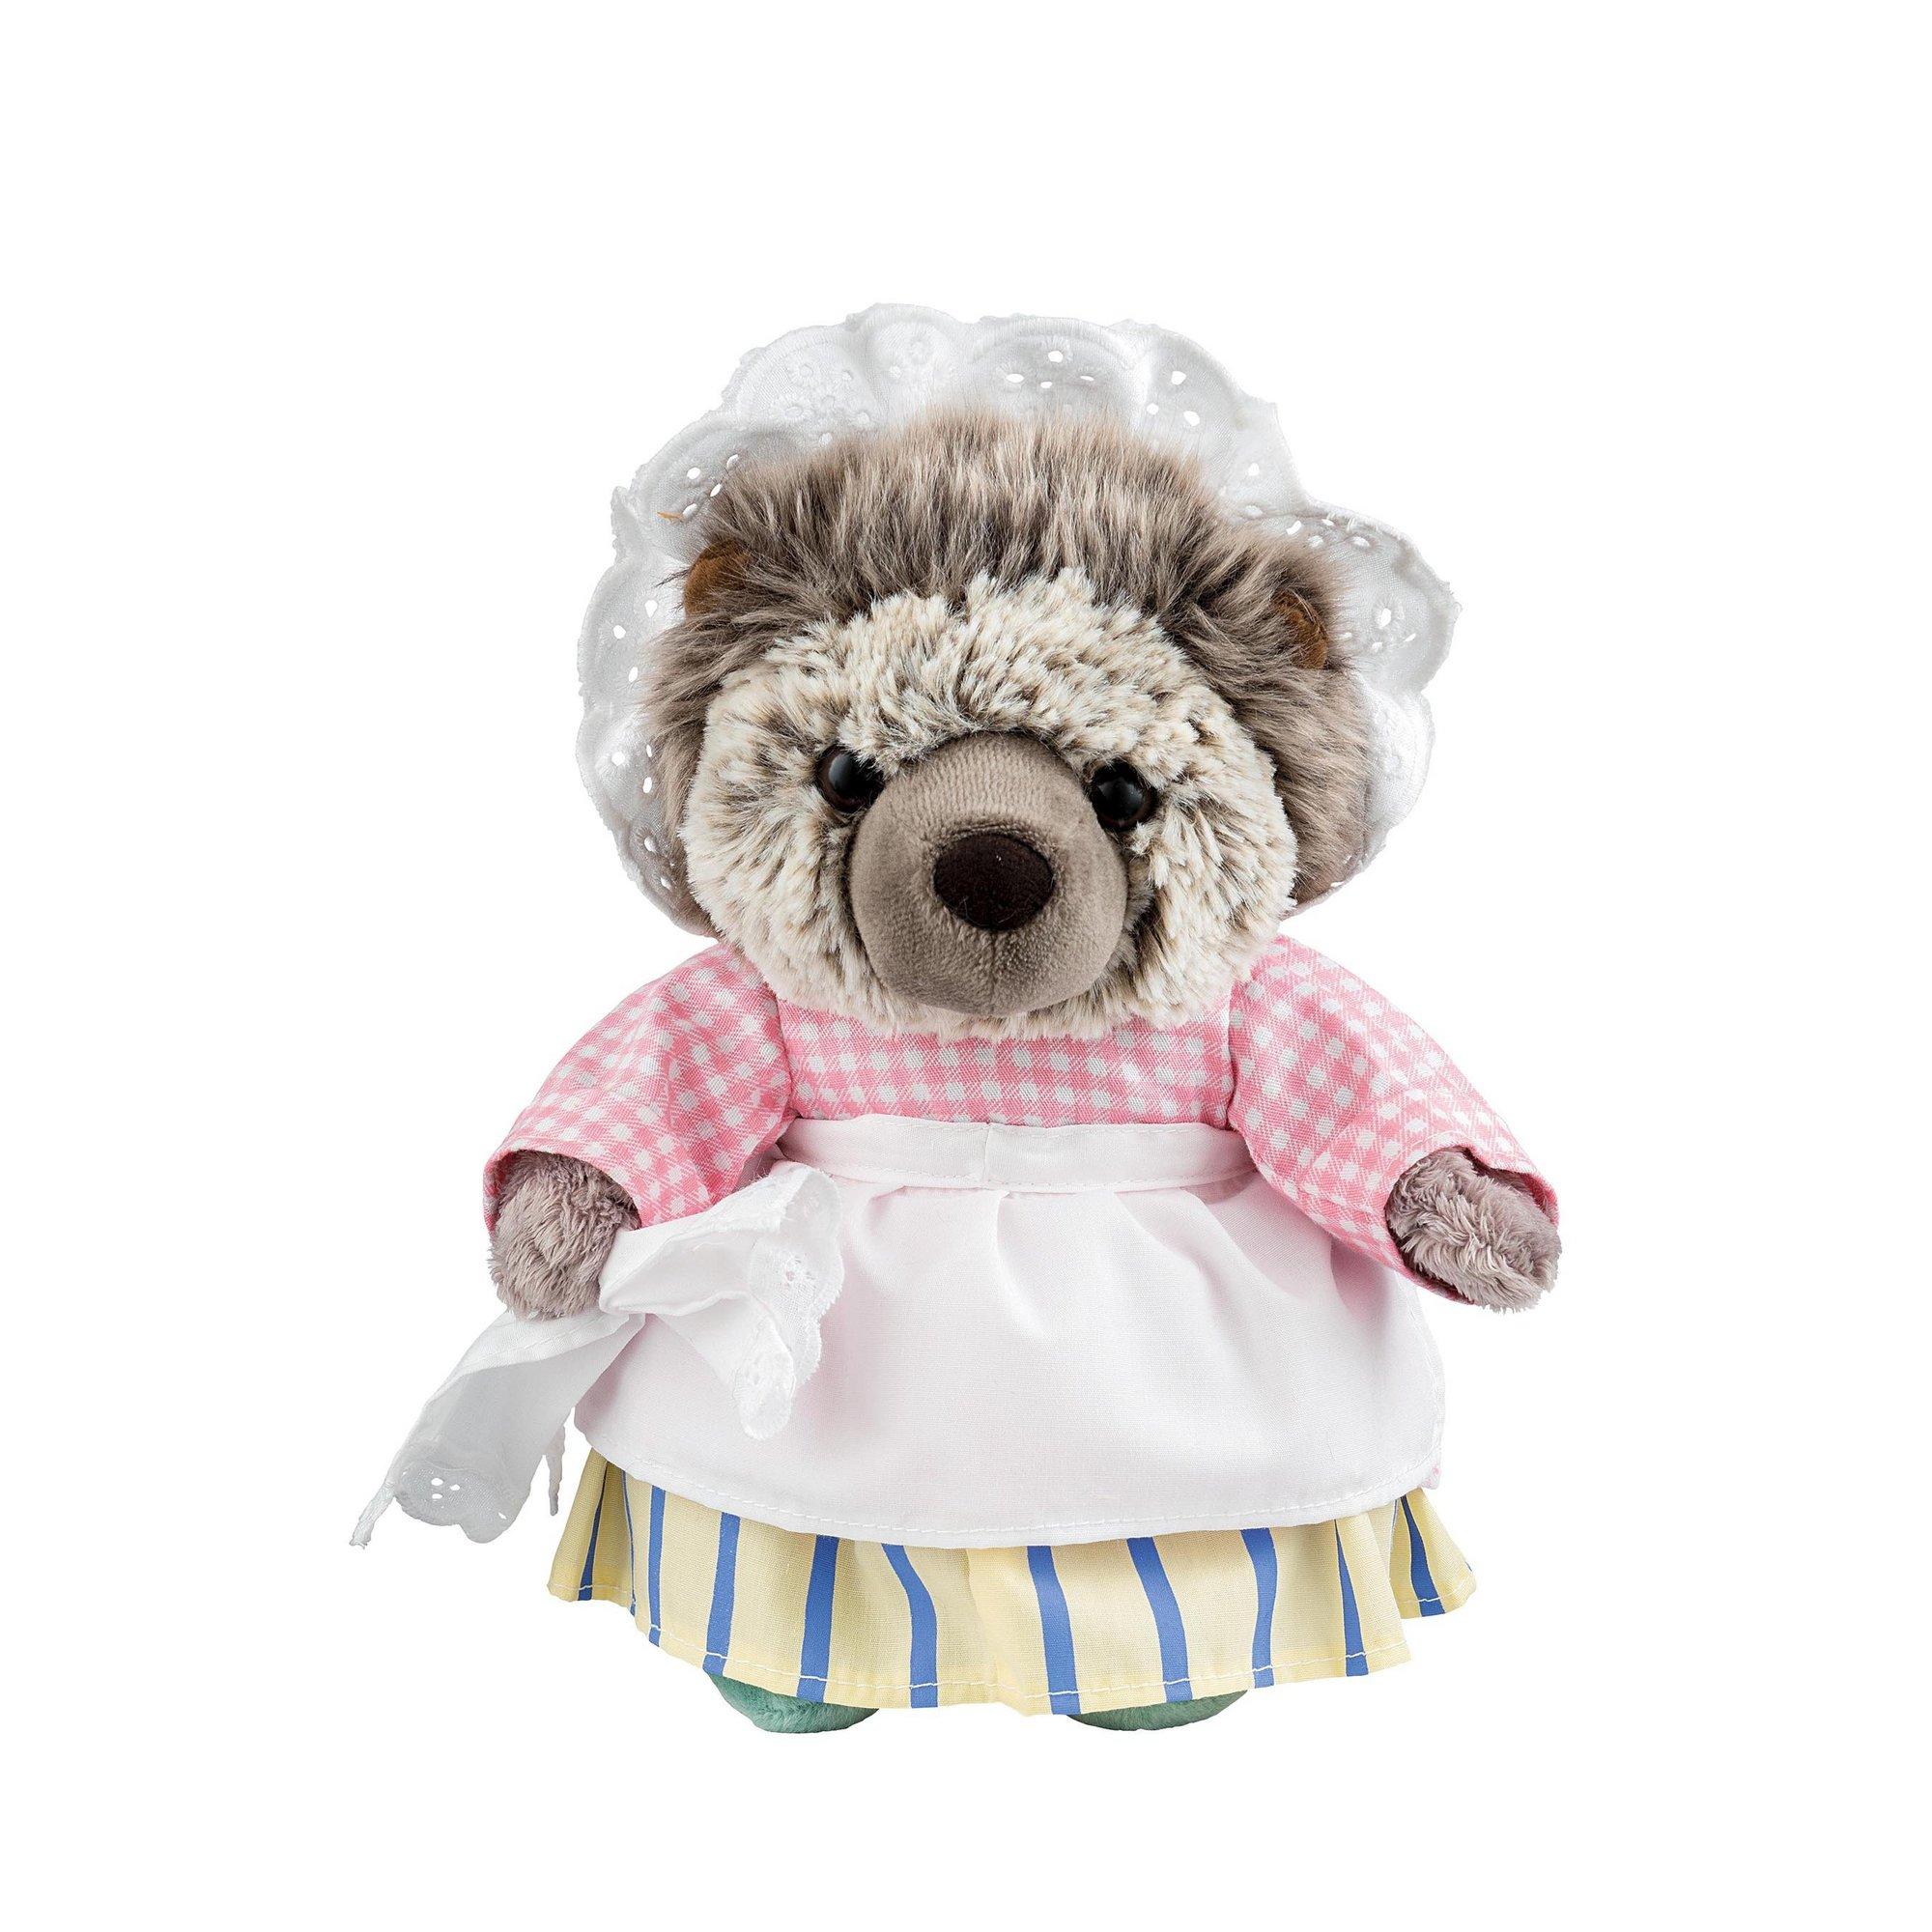 Image of Beatrix Potter Large Mrs Tiggy Winkle